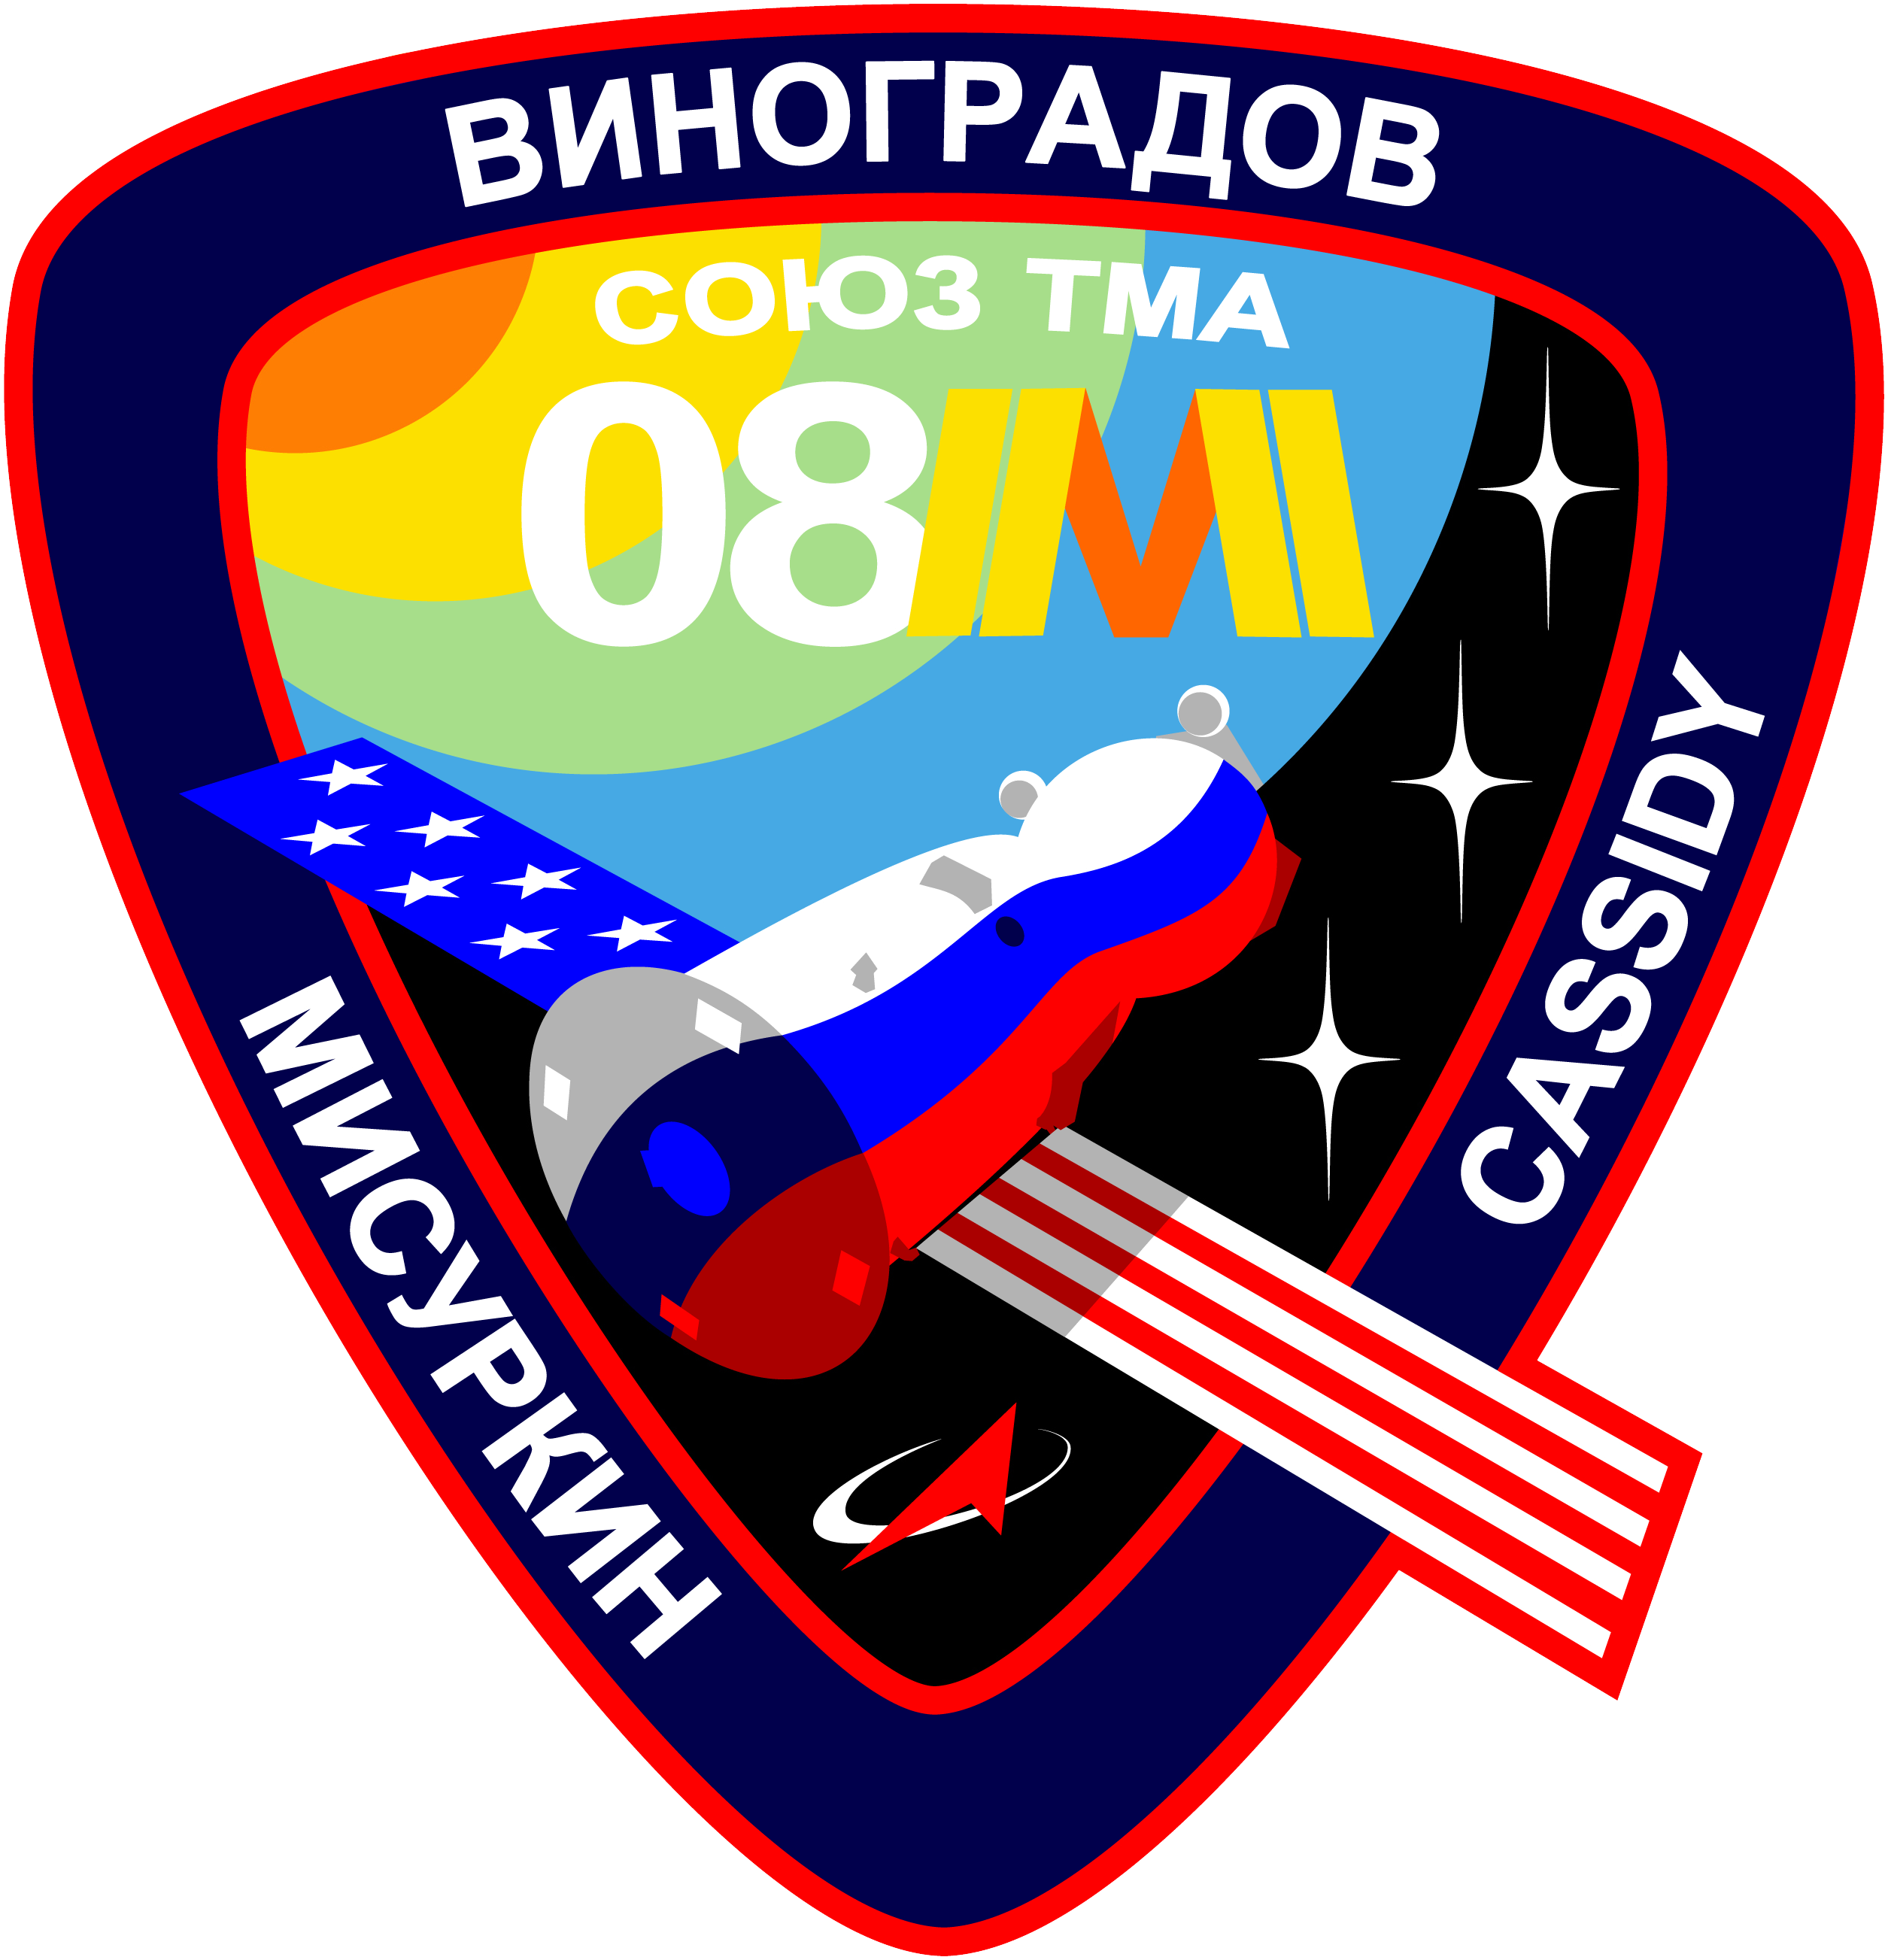 Datei:Soyuz.